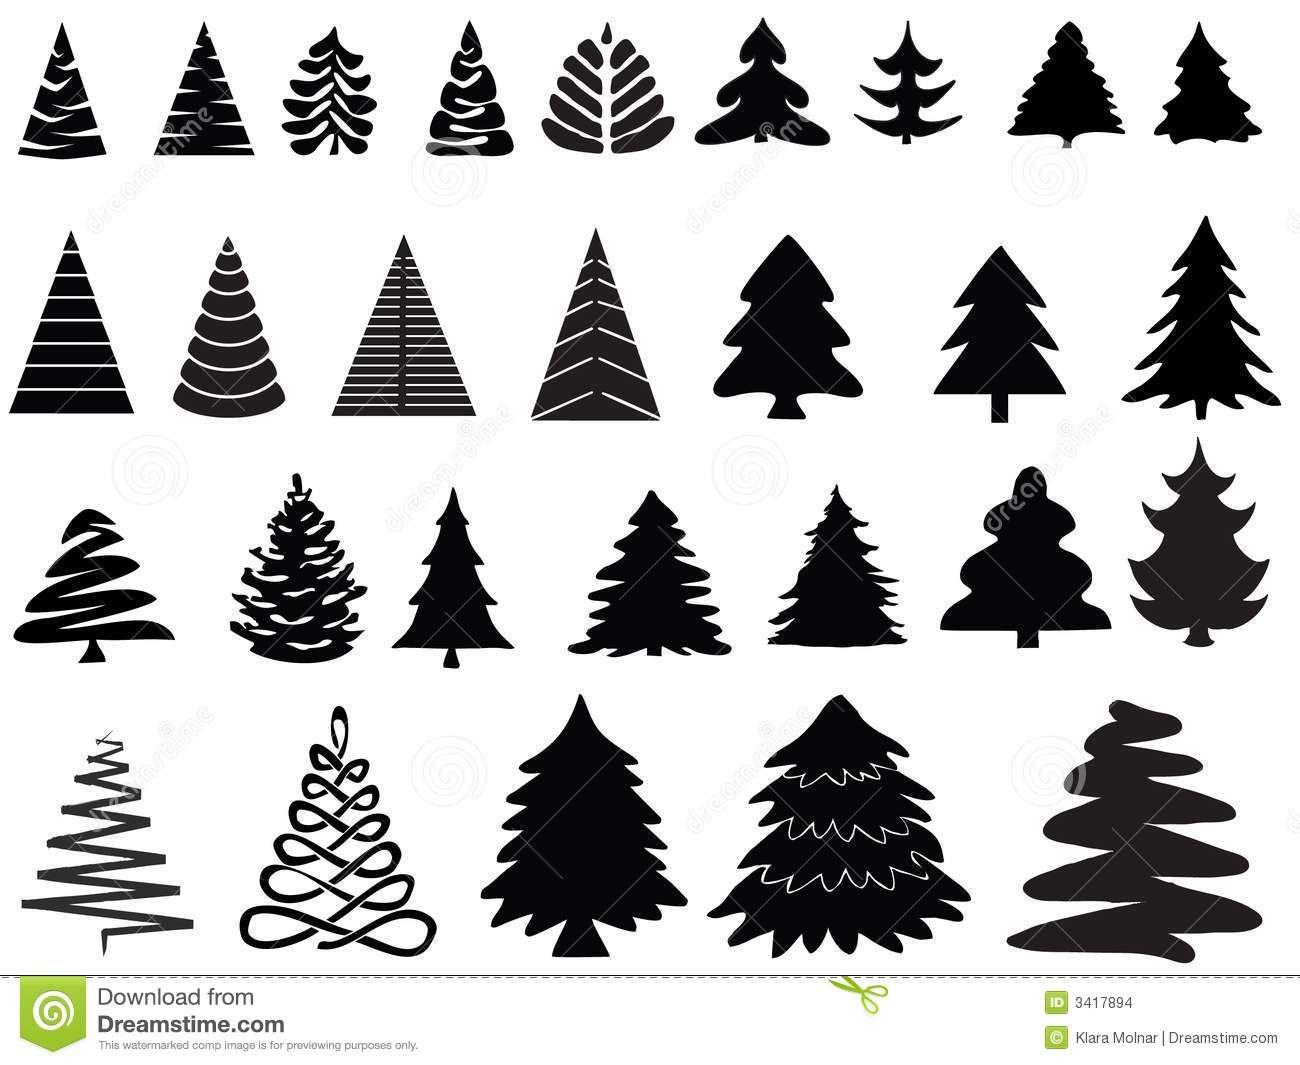 Vector Christmas Trees 3417894 Jpg 1300 1065 Pine Tree Silhouette Christmas Tree Images Tree Illustration